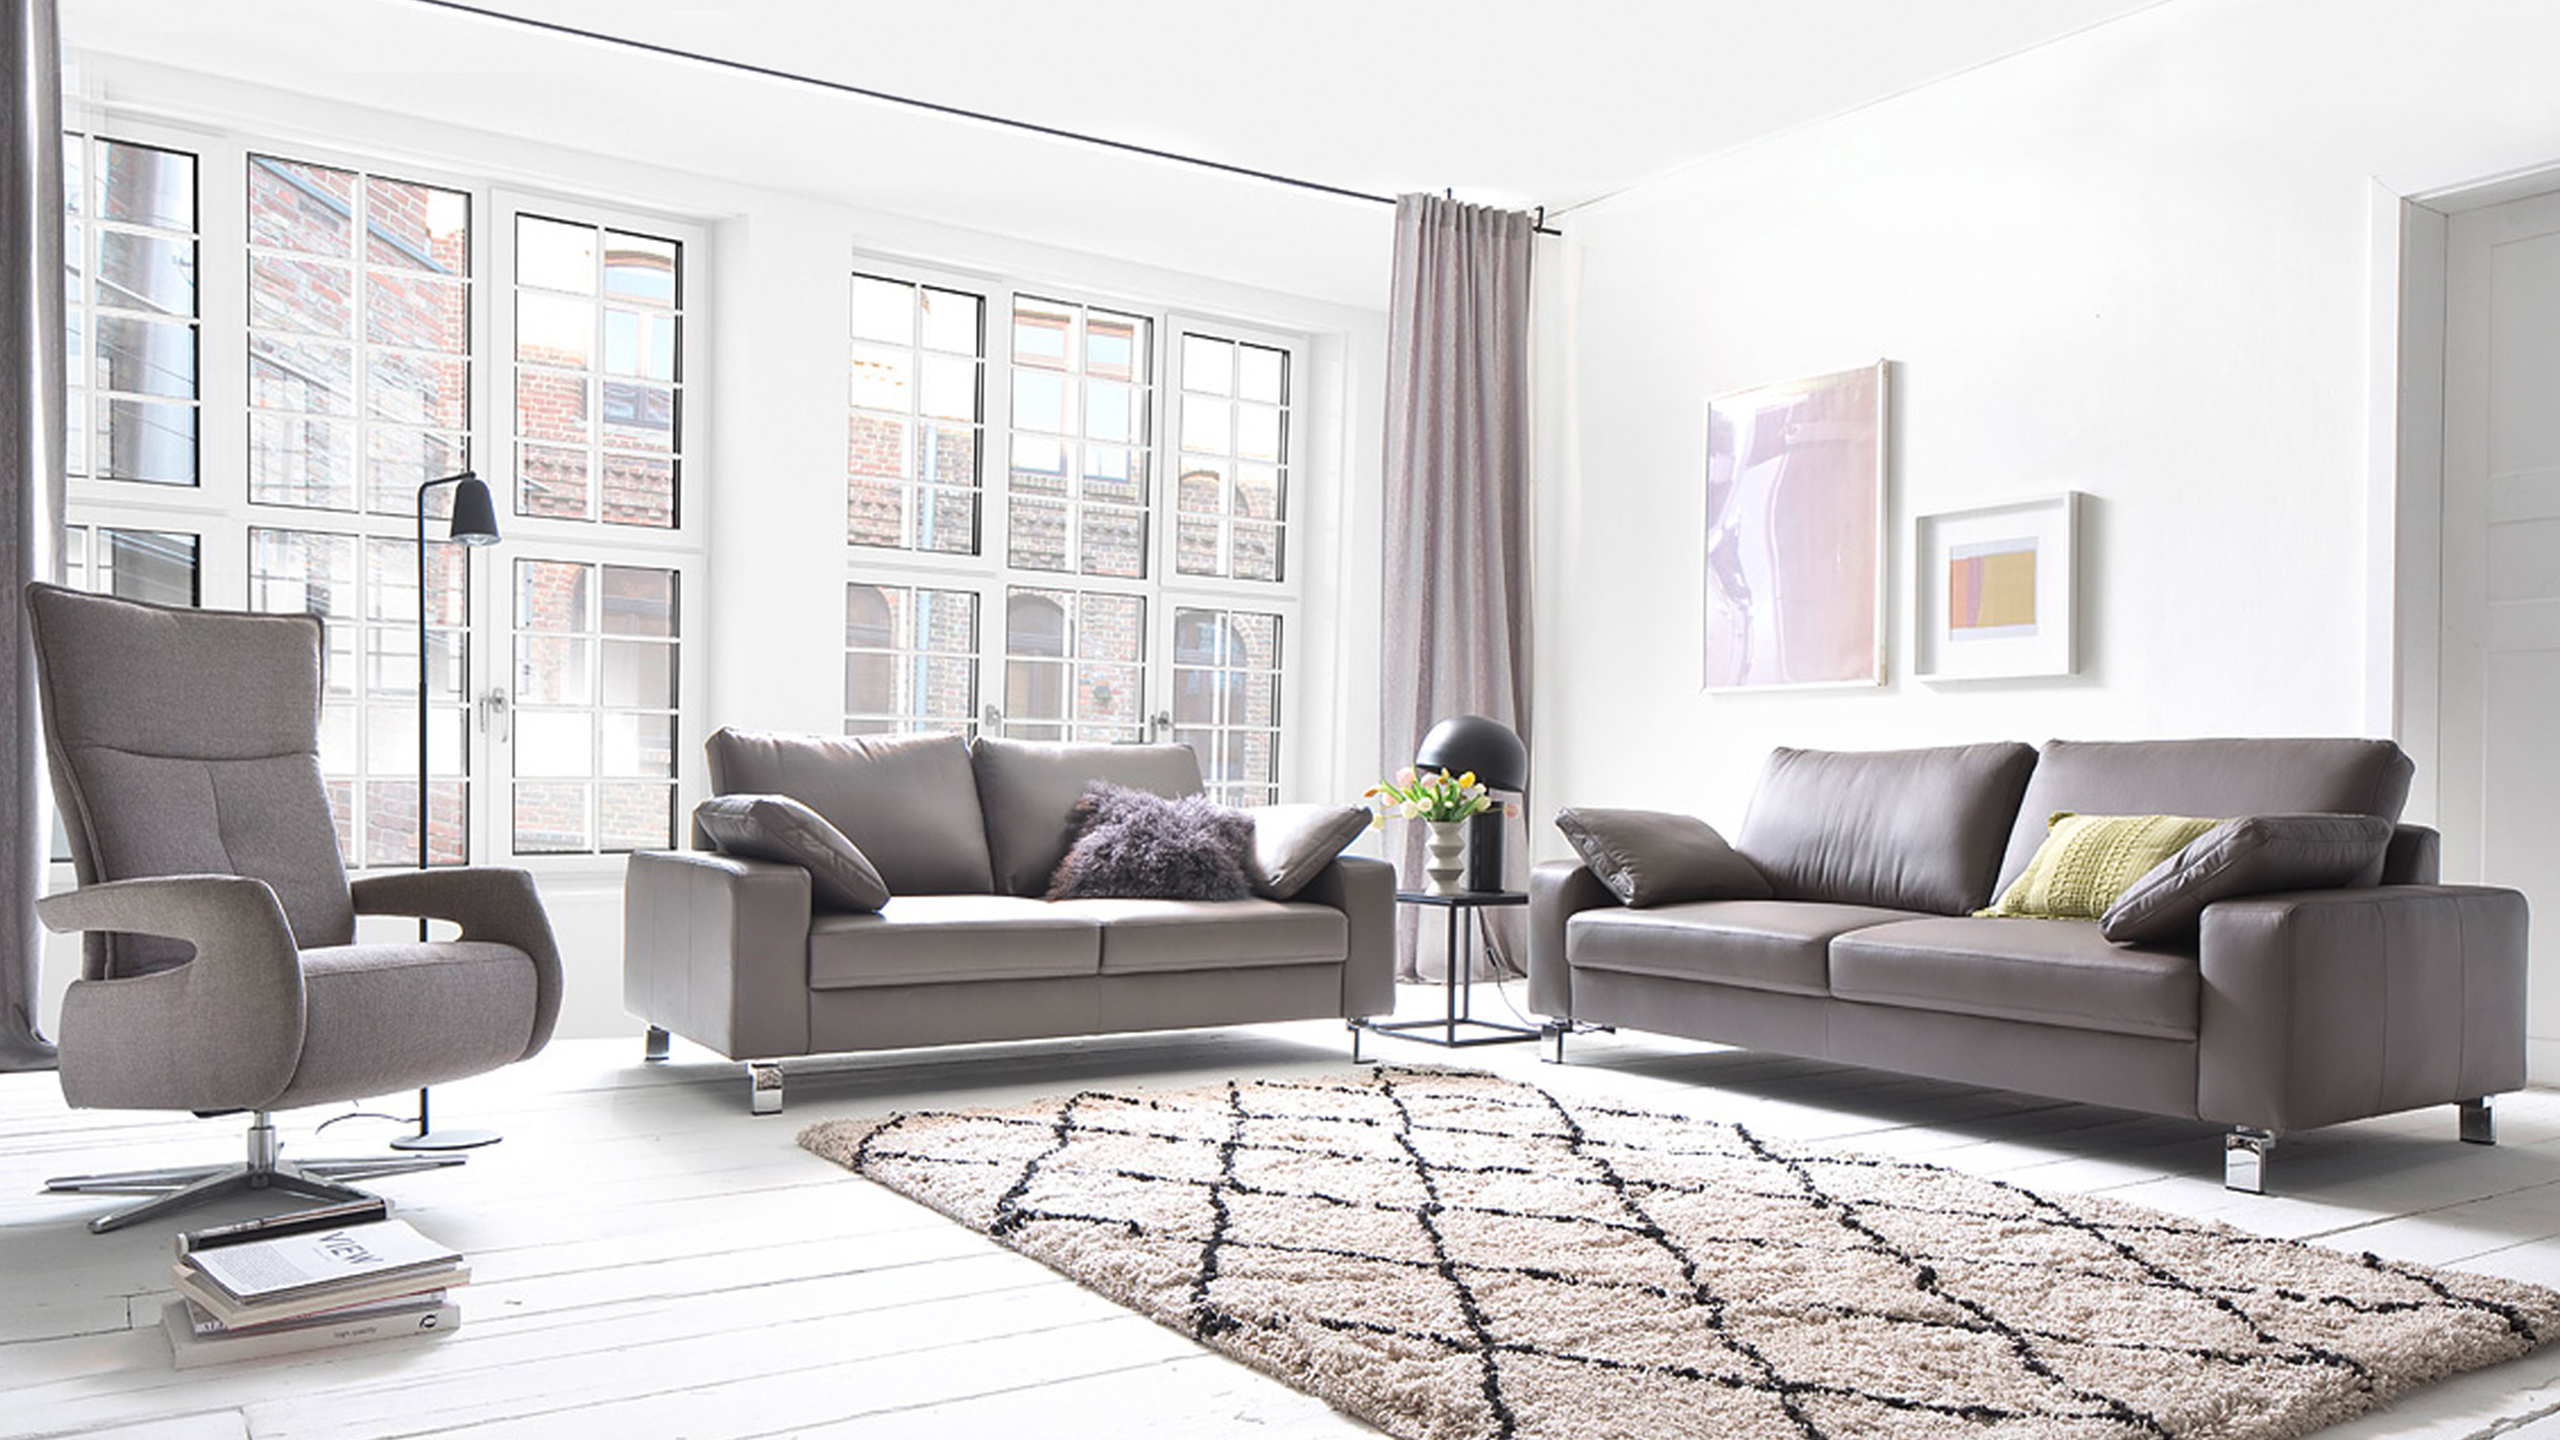 Indiana Sofa Garnitur Grau